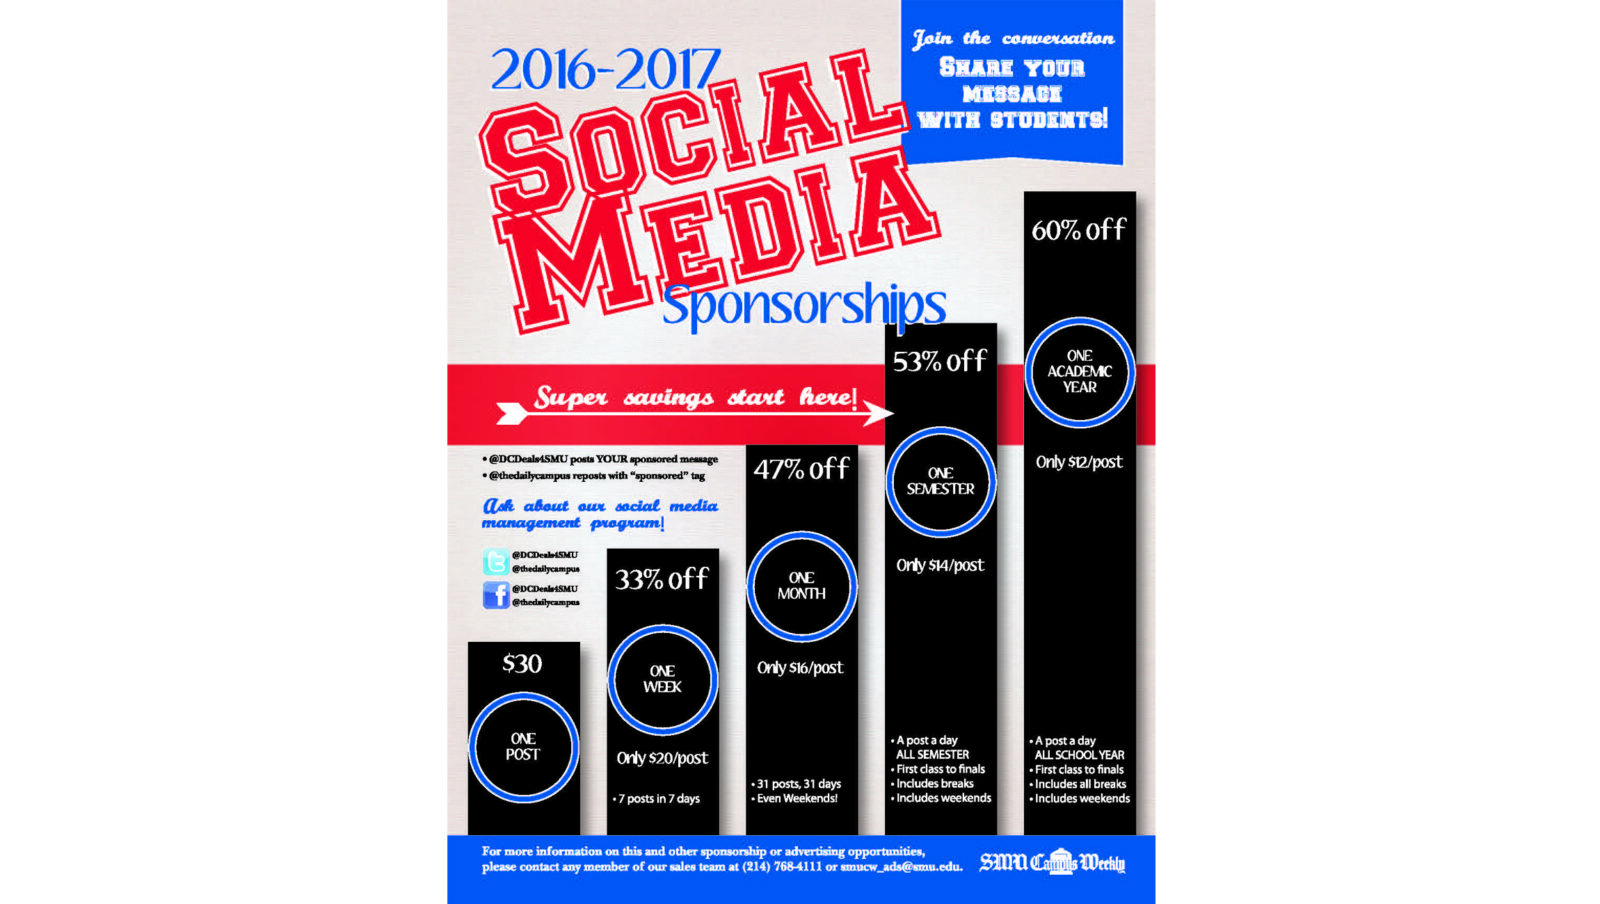 Social media sponsorship flier